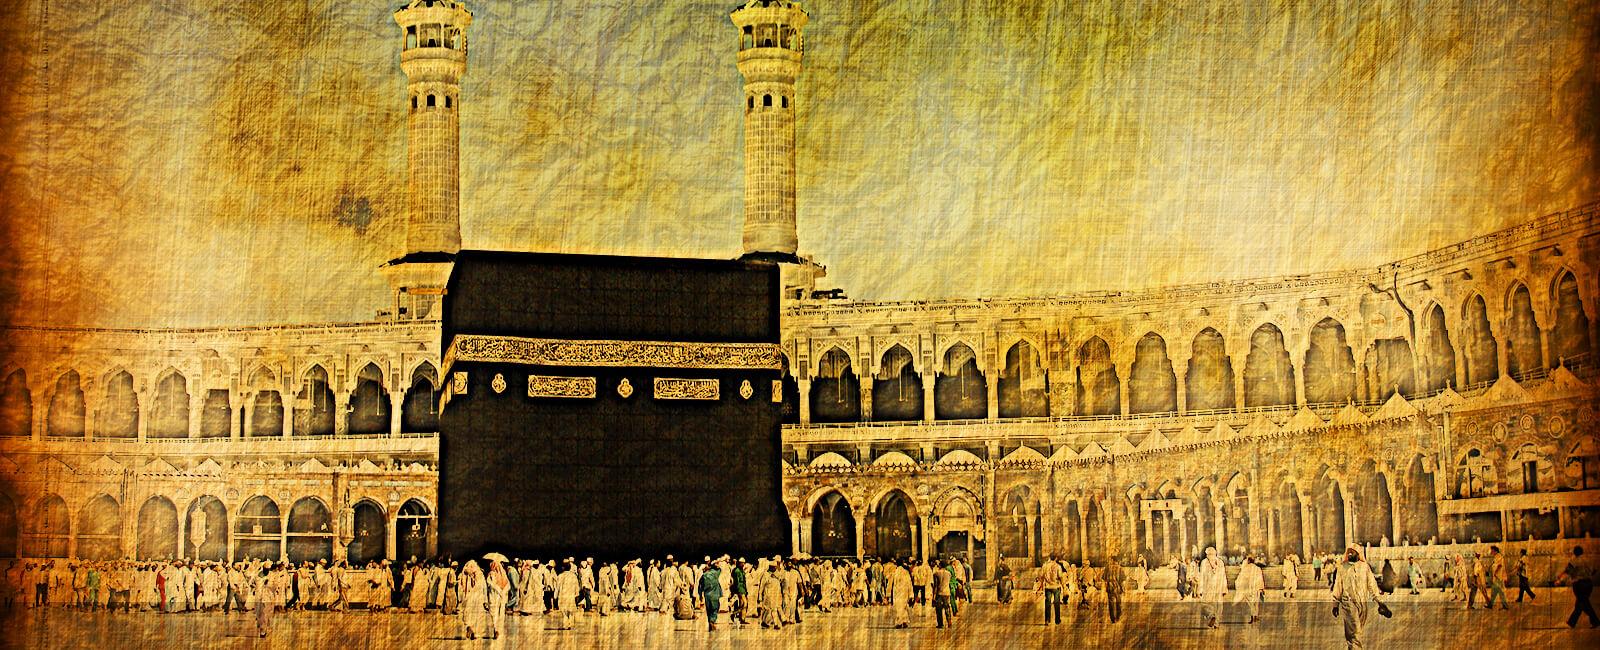 Umrah Banner: Cosmic Travels Documentation & Visas, Hajj & Umrah